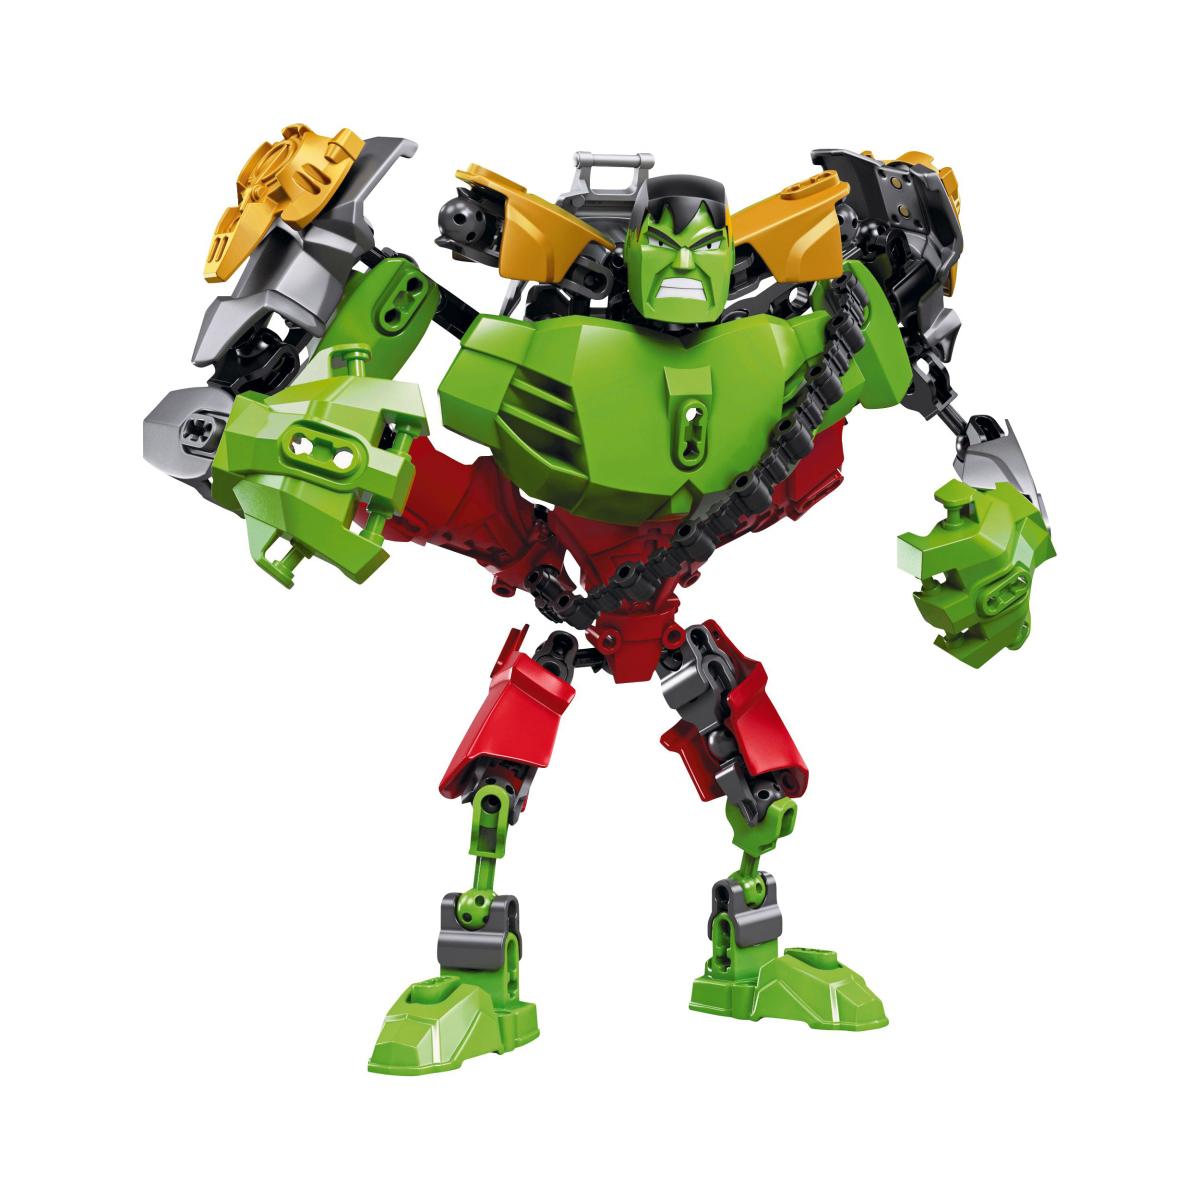 LEGO Ultrabuild Hulk 4597 Iron Man Combo Assembled